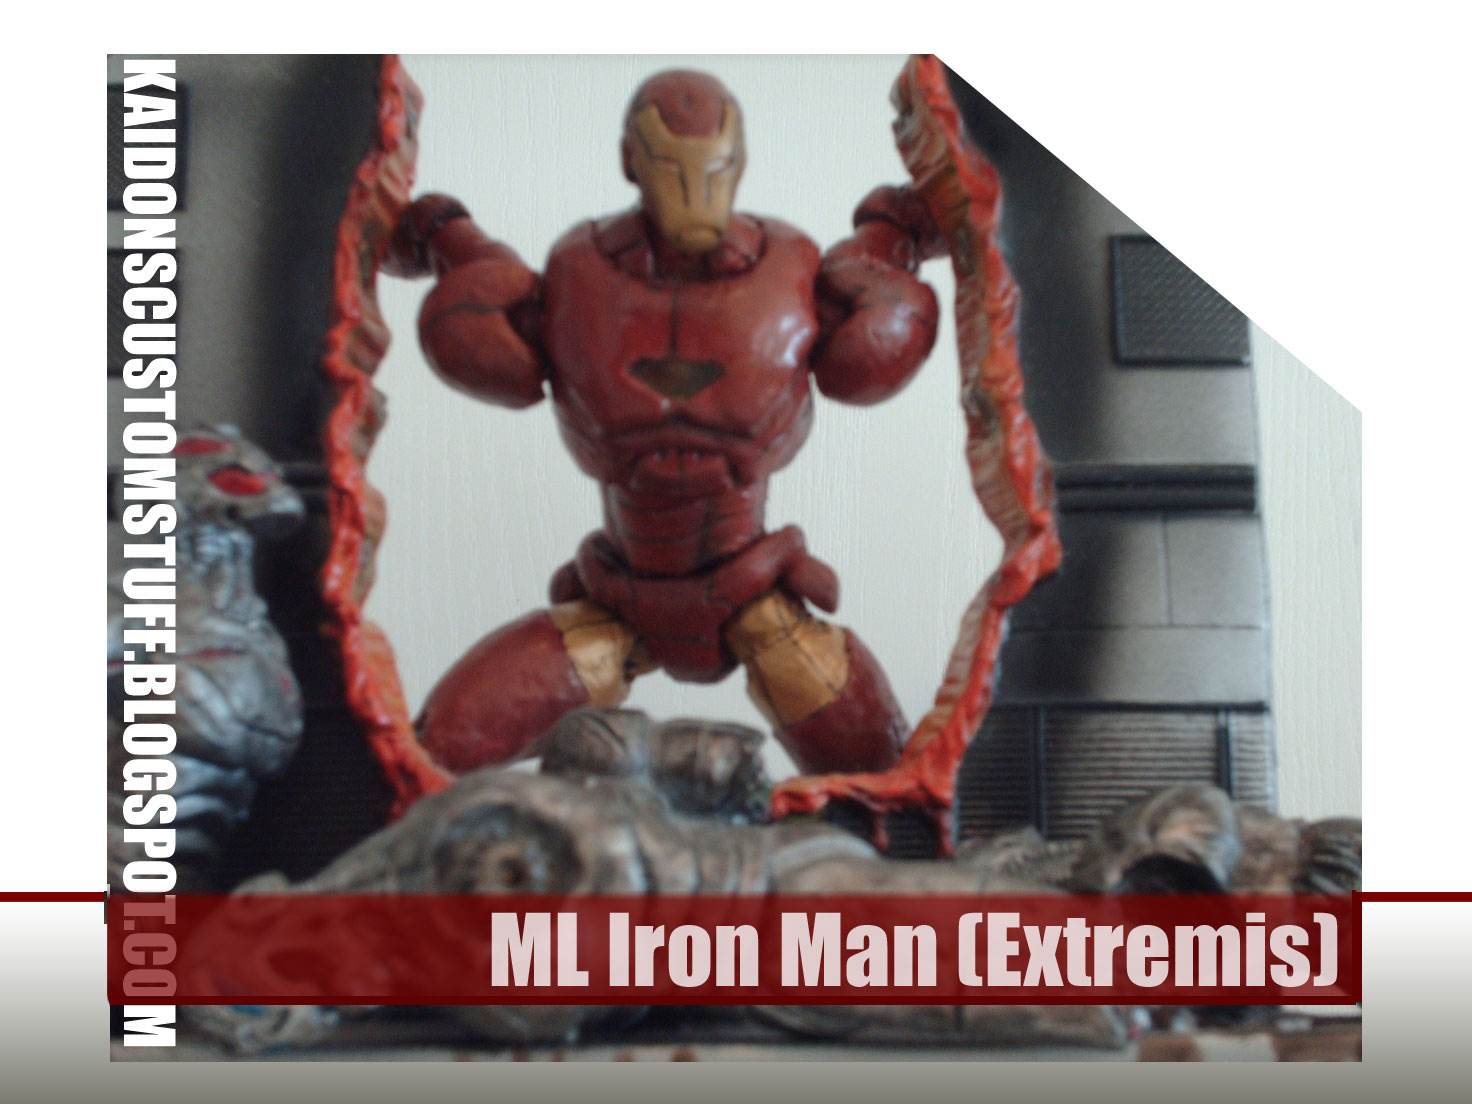 http://4.bp.blogspot.com/_NydzcGVJtdA/TObicFqKr1I/AAAAAAAAATM/Ur7oUcrDXZ0/s1600/ML-Iron-Man-Extremis-09.jpg